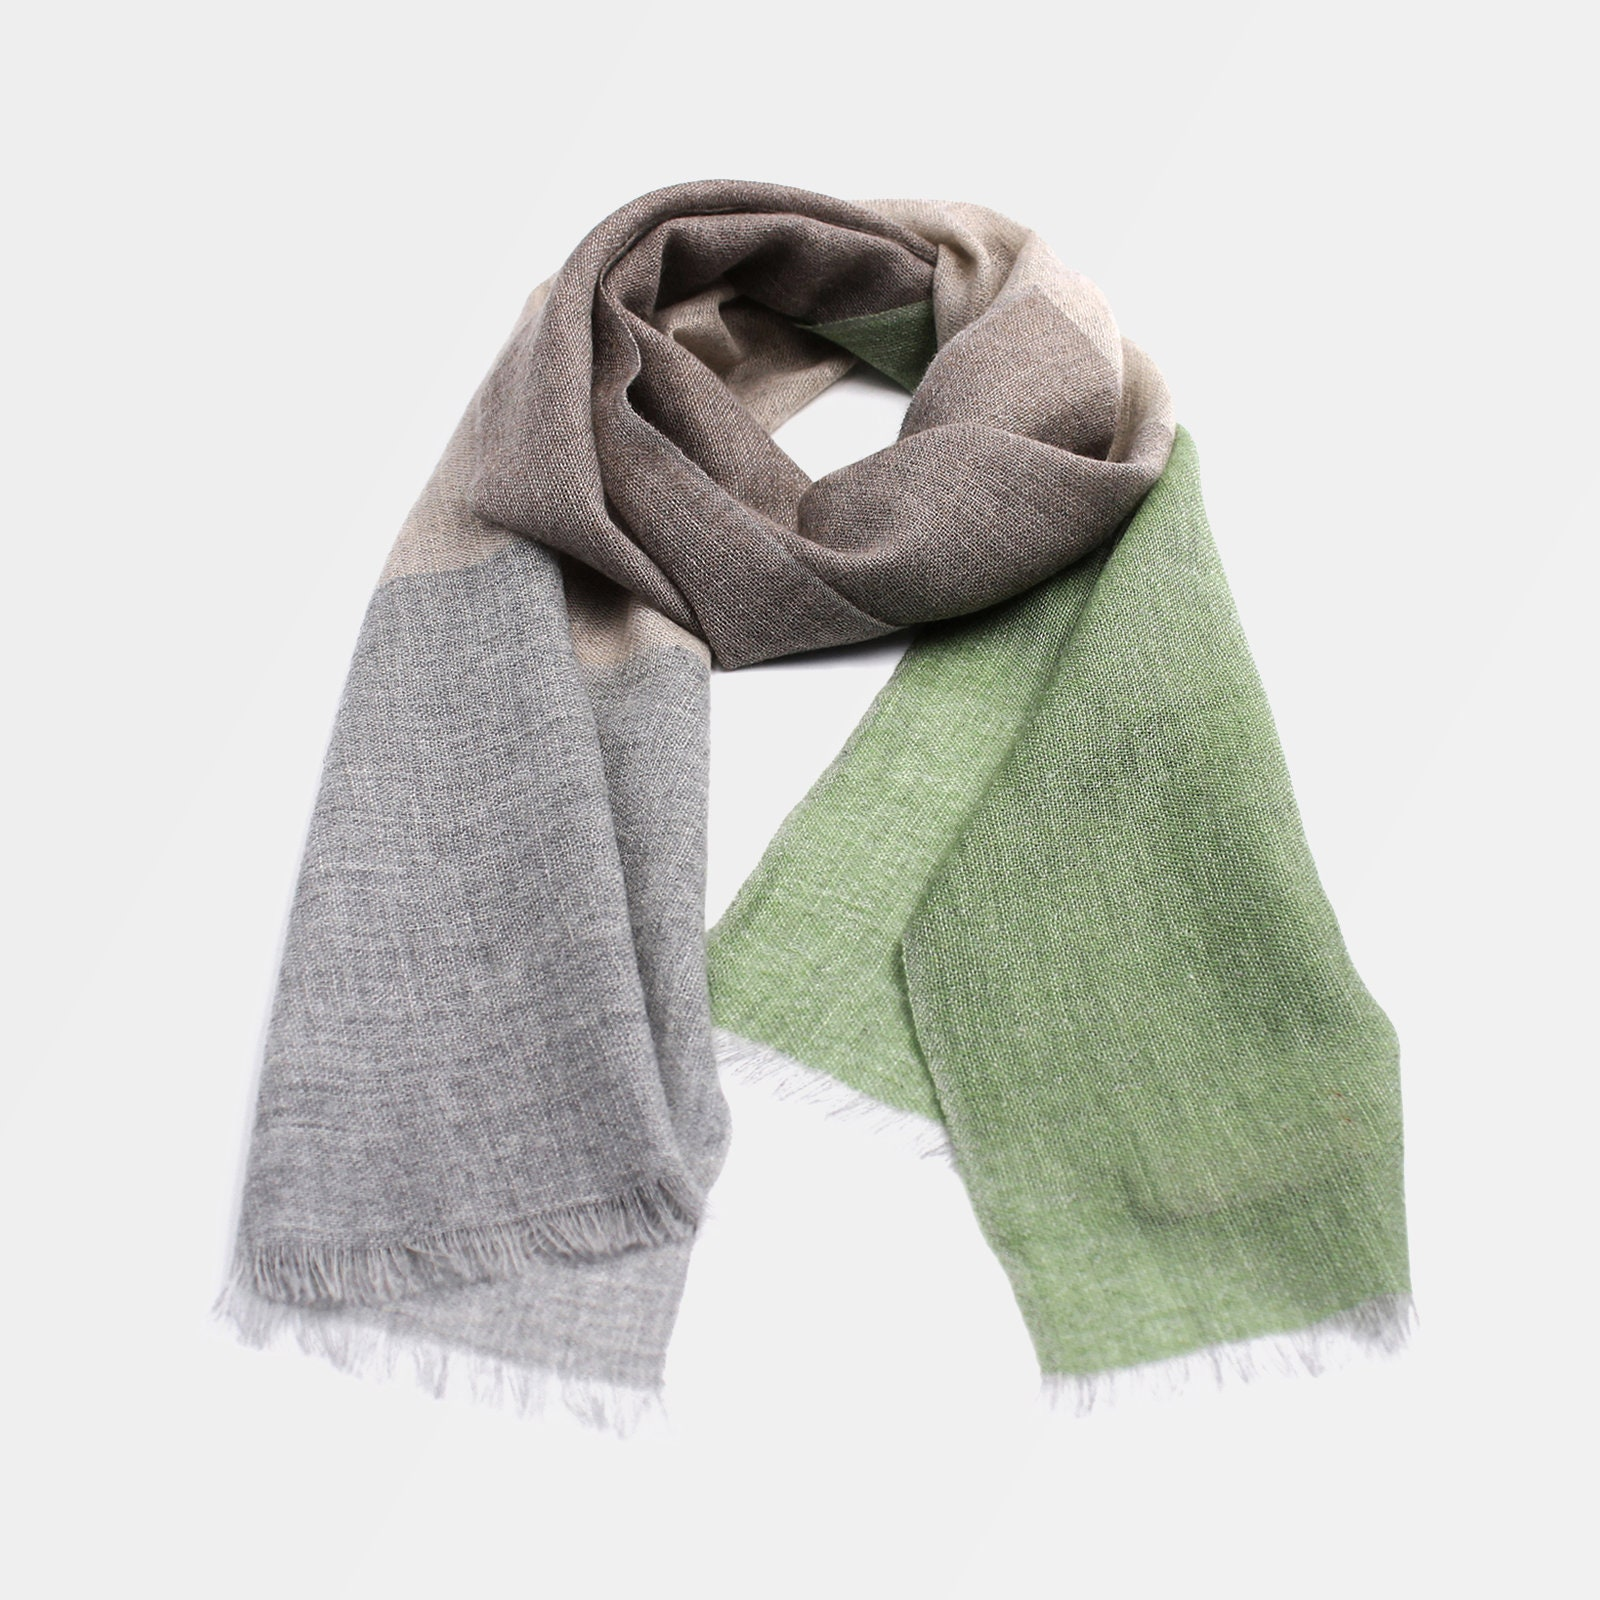 Eco écharpe foulard ultra doux 100 % cachemire écharpe voyage écharpe  écharpe voyage en cachemire - 8d57f228fb6